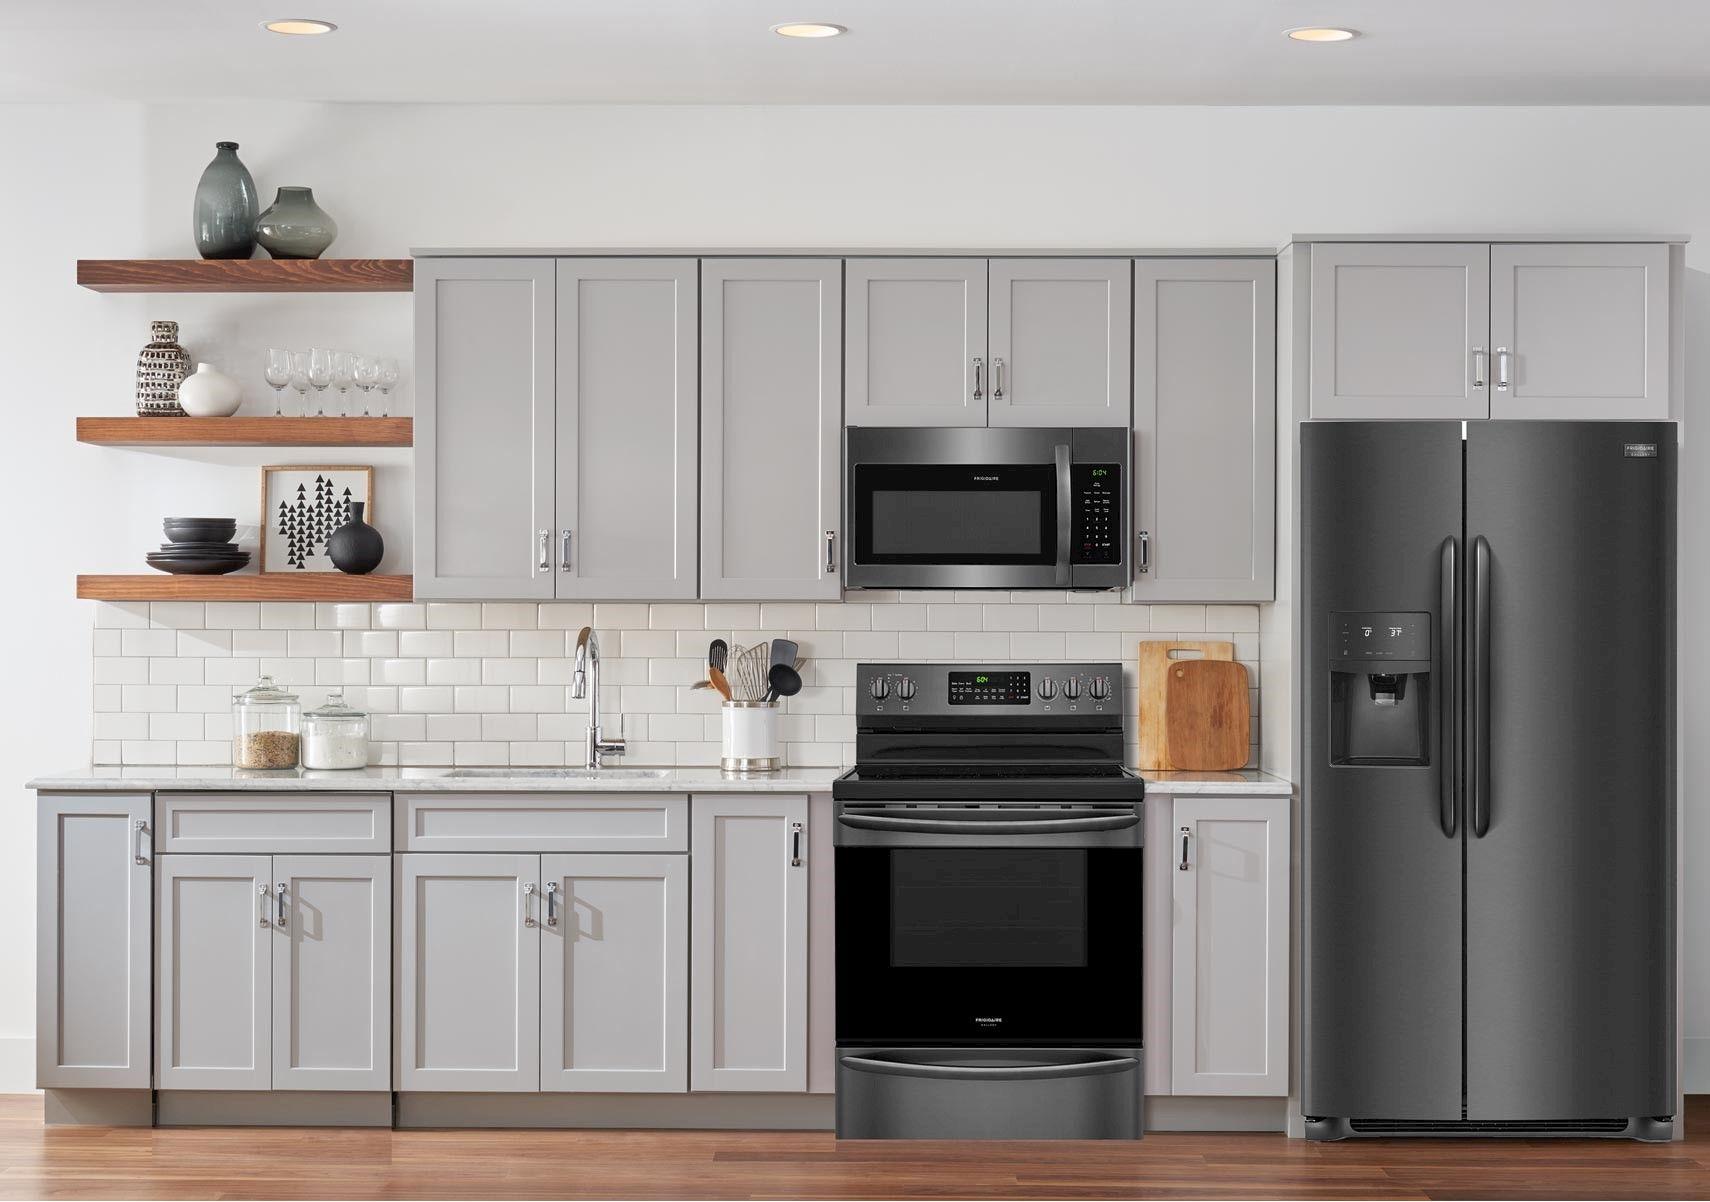 Lacks Fridgidare 3 Pc Black Stainless Steel Kitchen Package Stainless Steel Kitchen Appliances Black Stainless Steel Kitchen Kitchen Appliance Packages